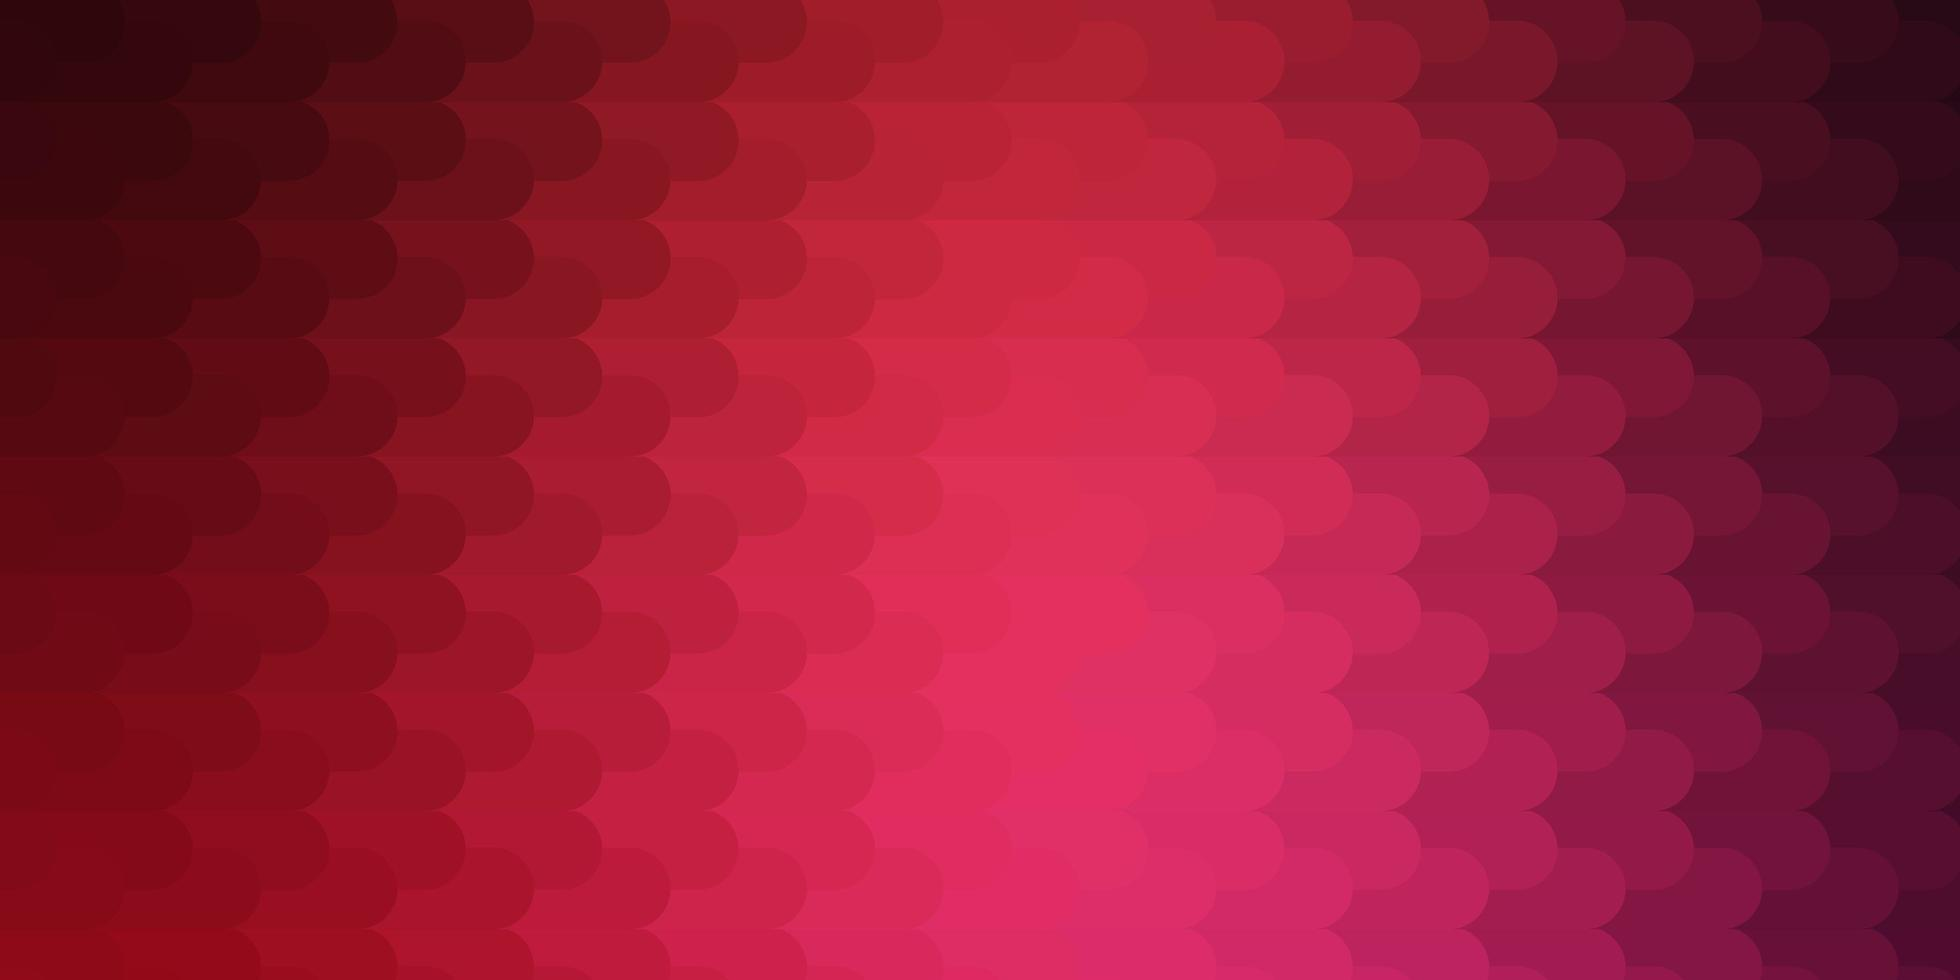 hellrosa, rotes Vektorlayout mit Linien. vektor